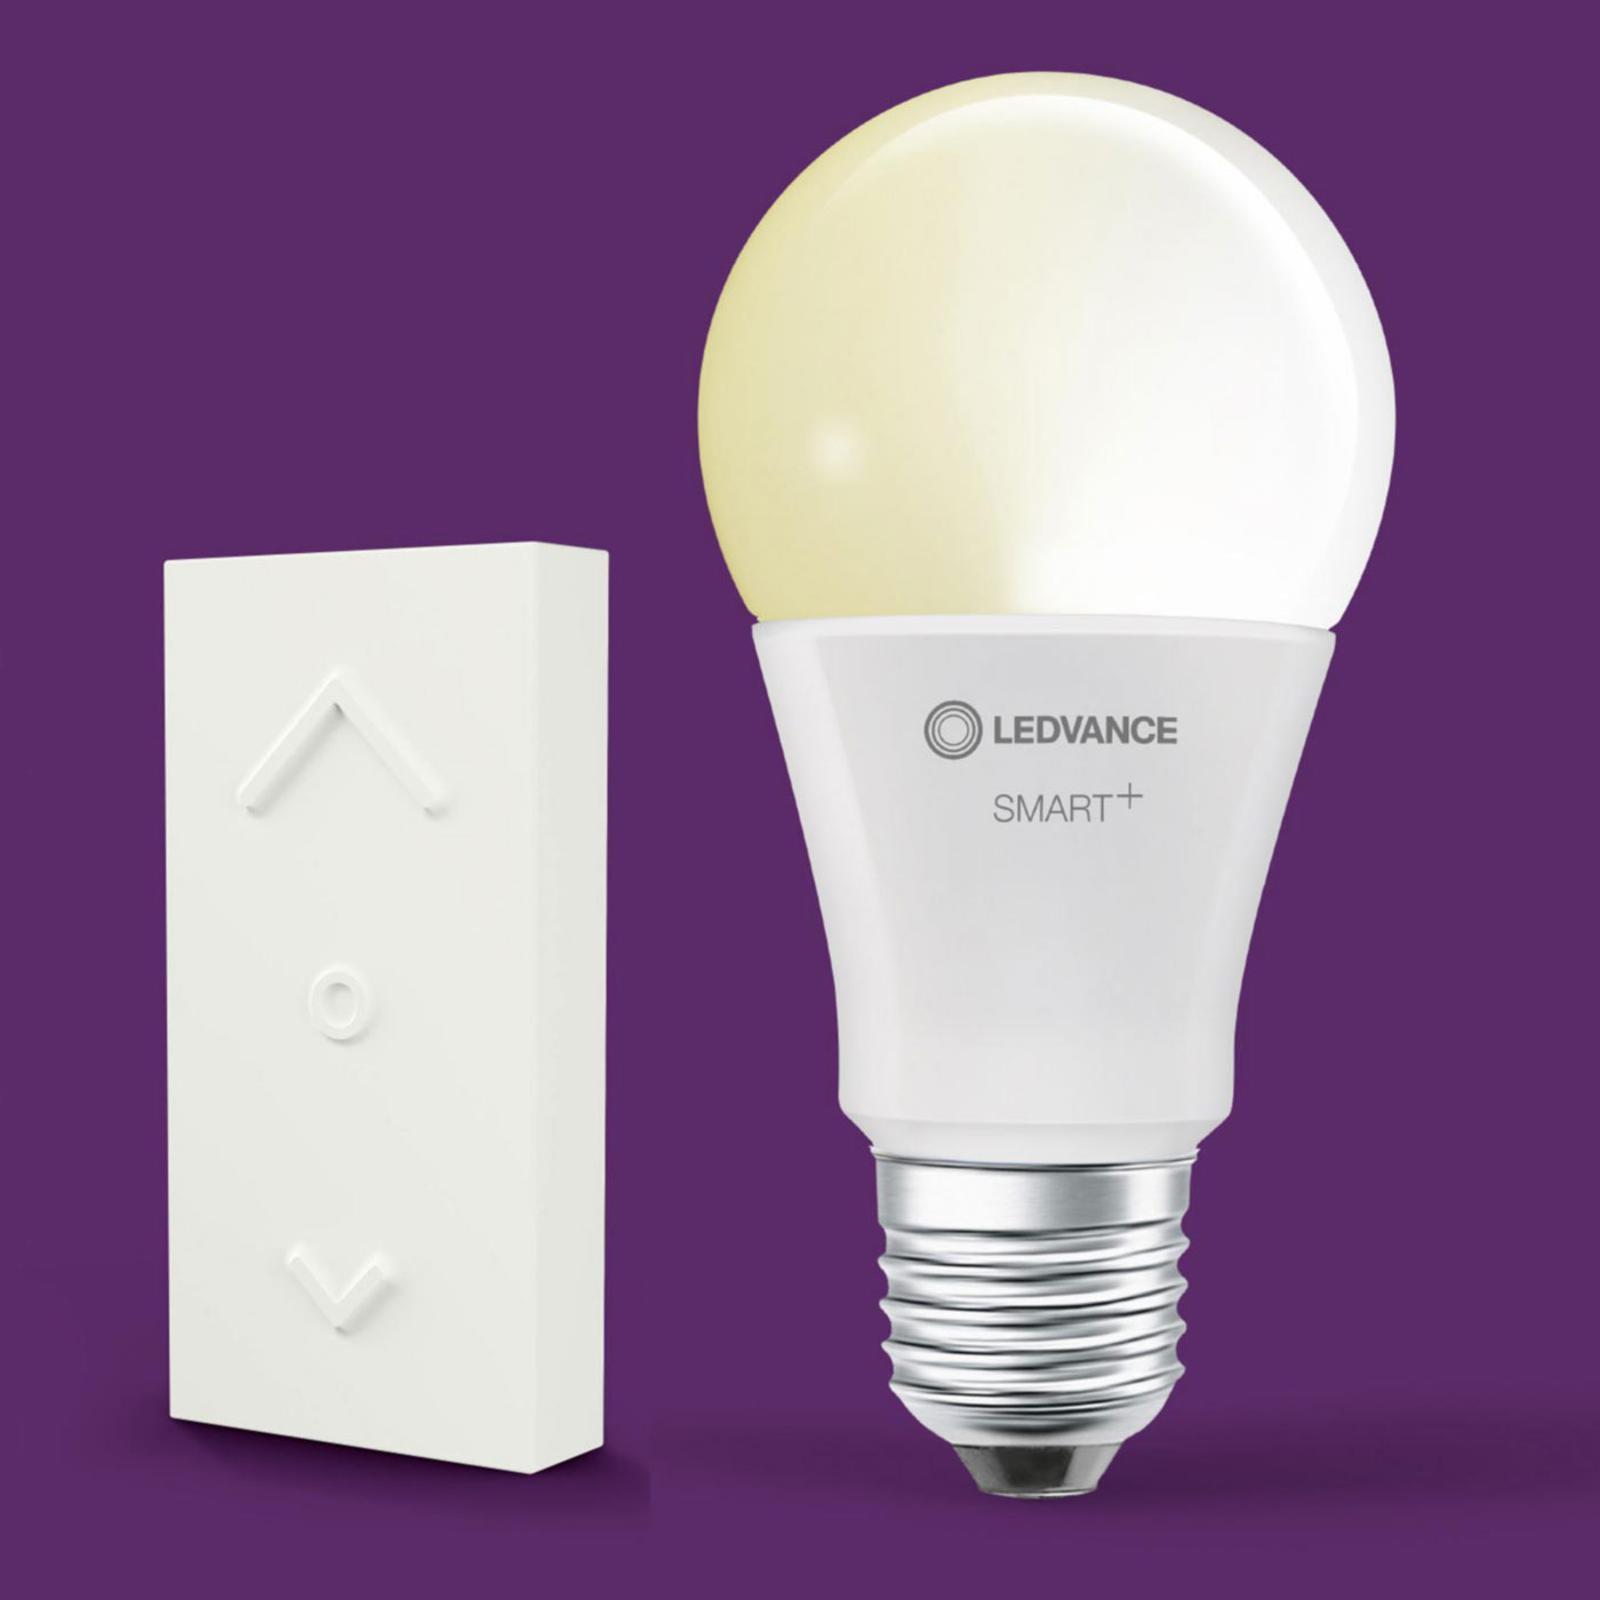 LEDVANCE SMART+ ZigBee E27 2 700 K 8,5W SwitchMini